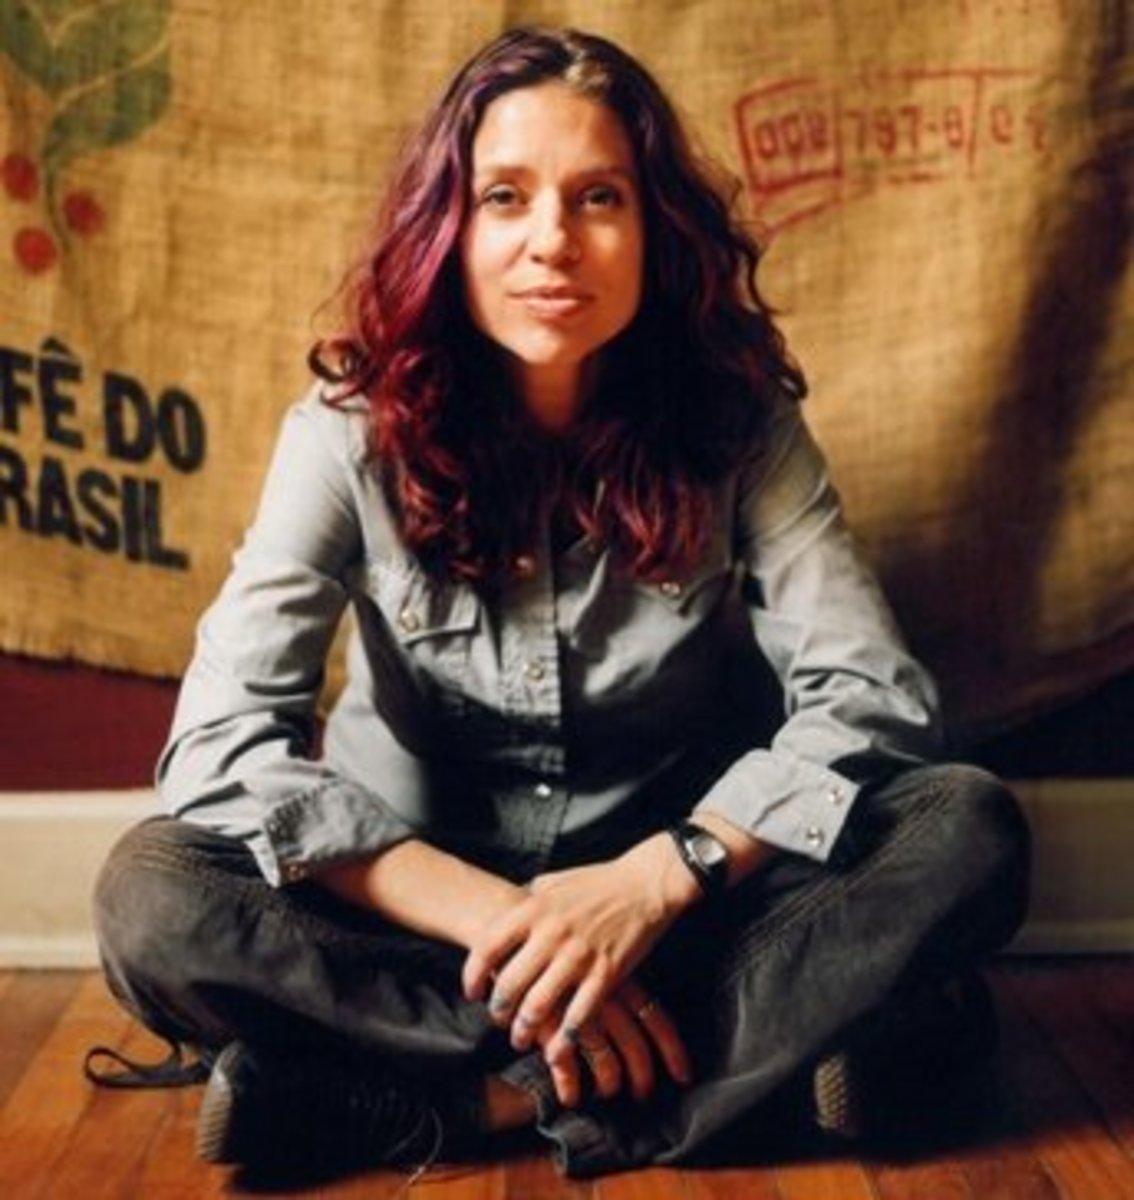 Singer-Songwriter-Musician Ani Difranco